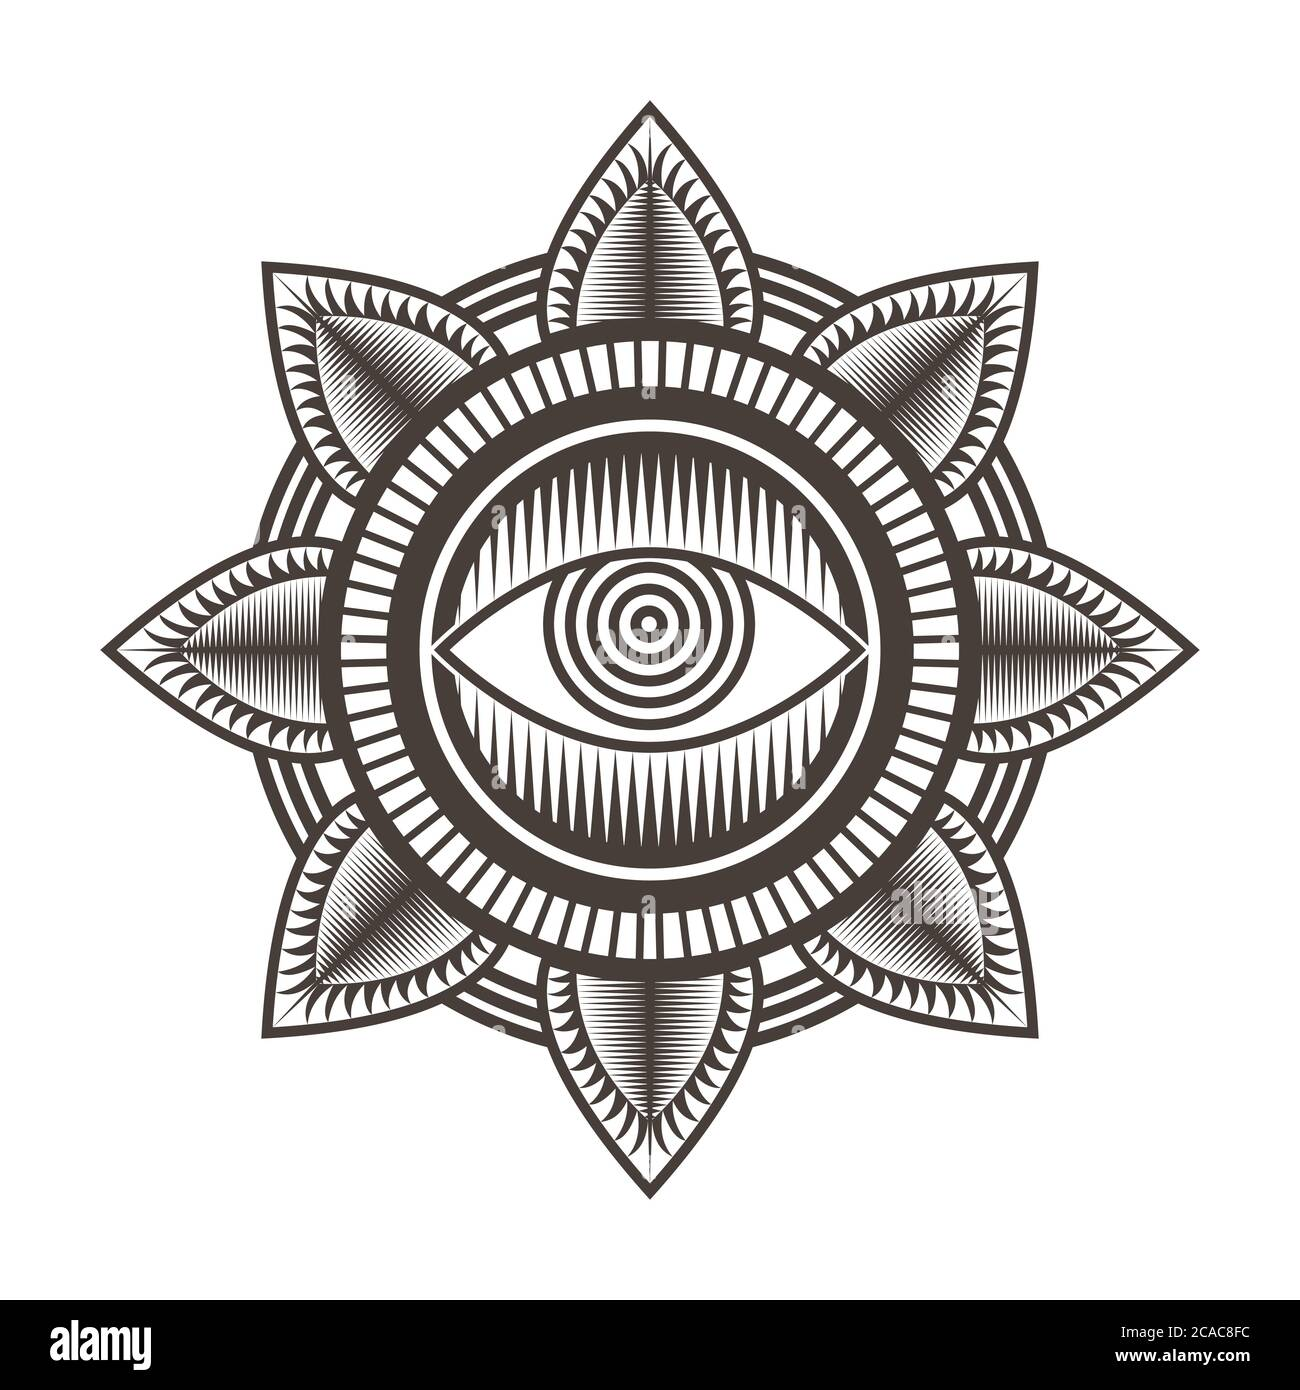 one eye mandala design vector illustration amazing design for your company or brand Stock Vector